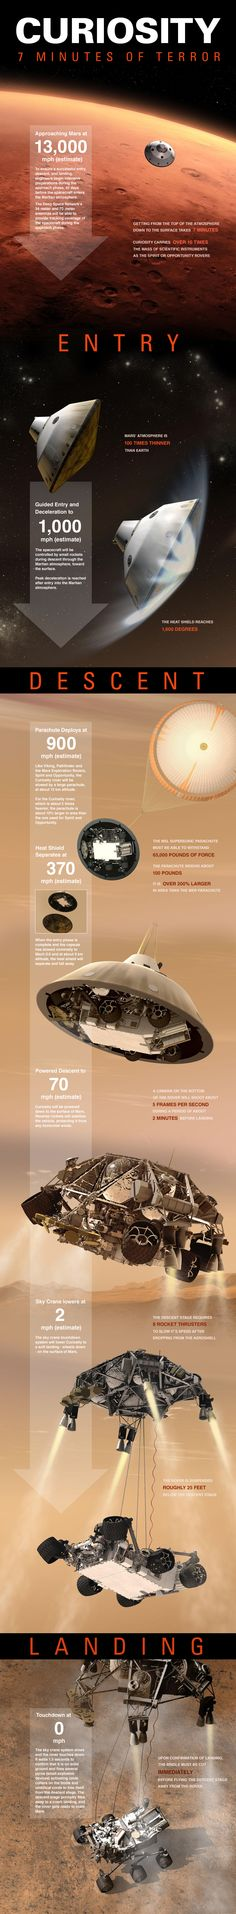 Nice Infographic of NASA's Curiosity Rover.     Jet Propulsion Laboratory - Curiosity - 7 Minutes of Terror